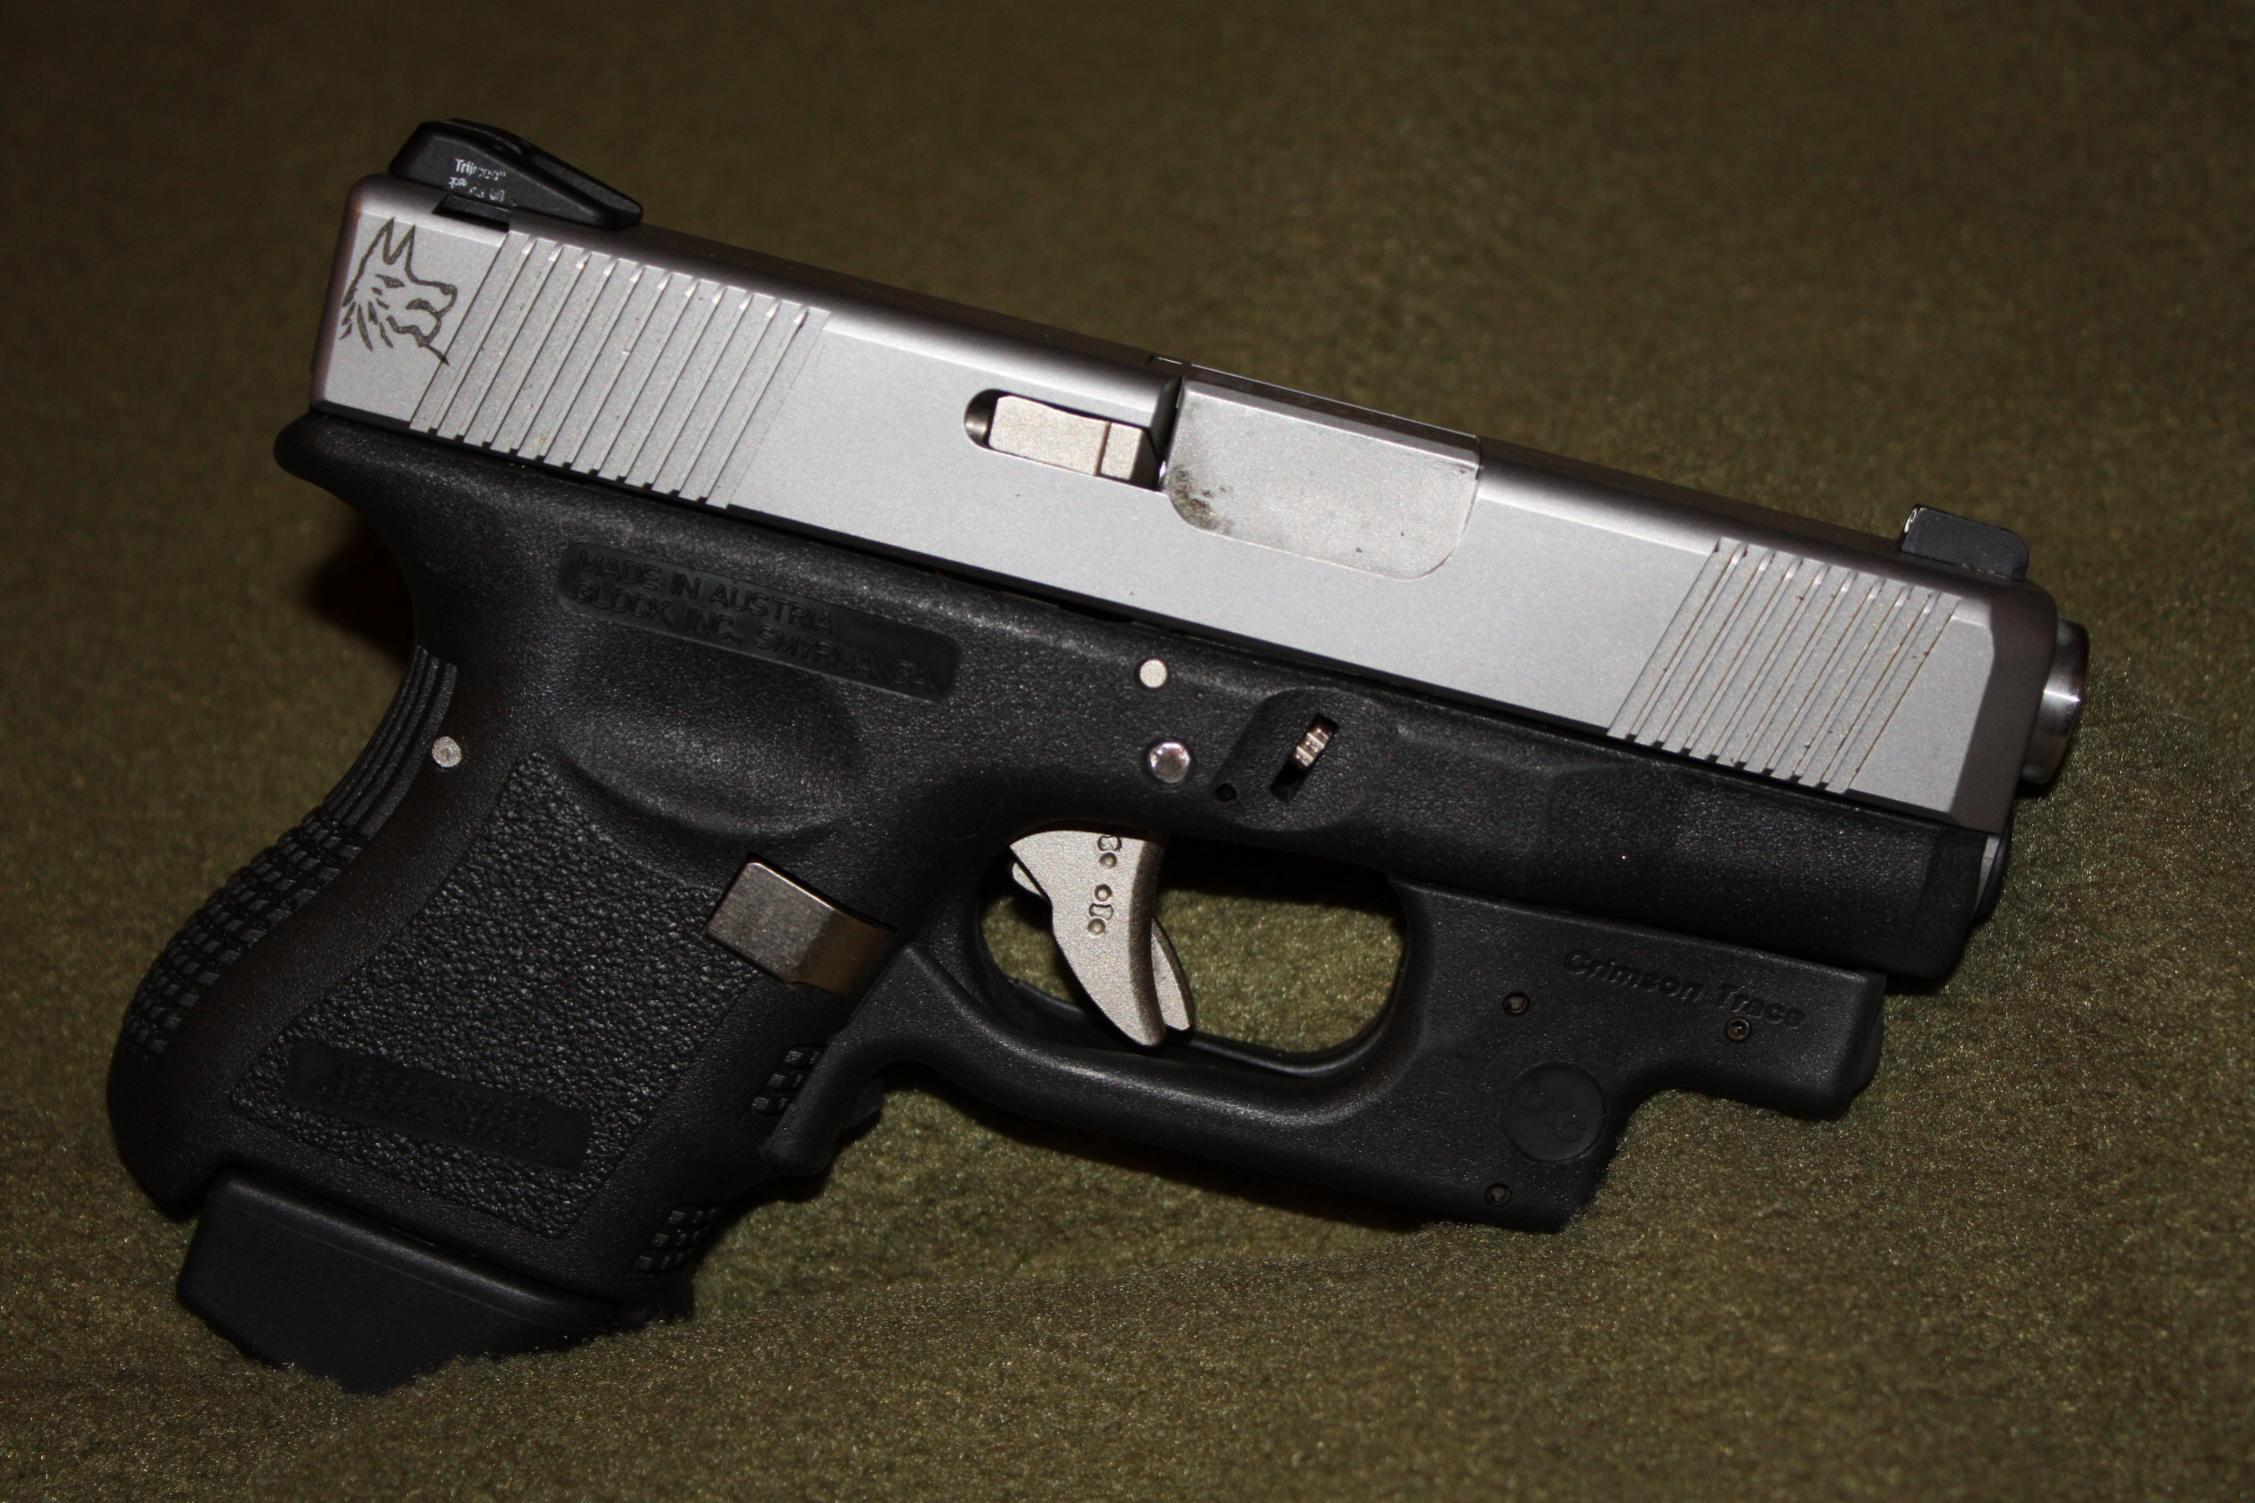 Glock 27, My Latest Project-img_1202.jpg